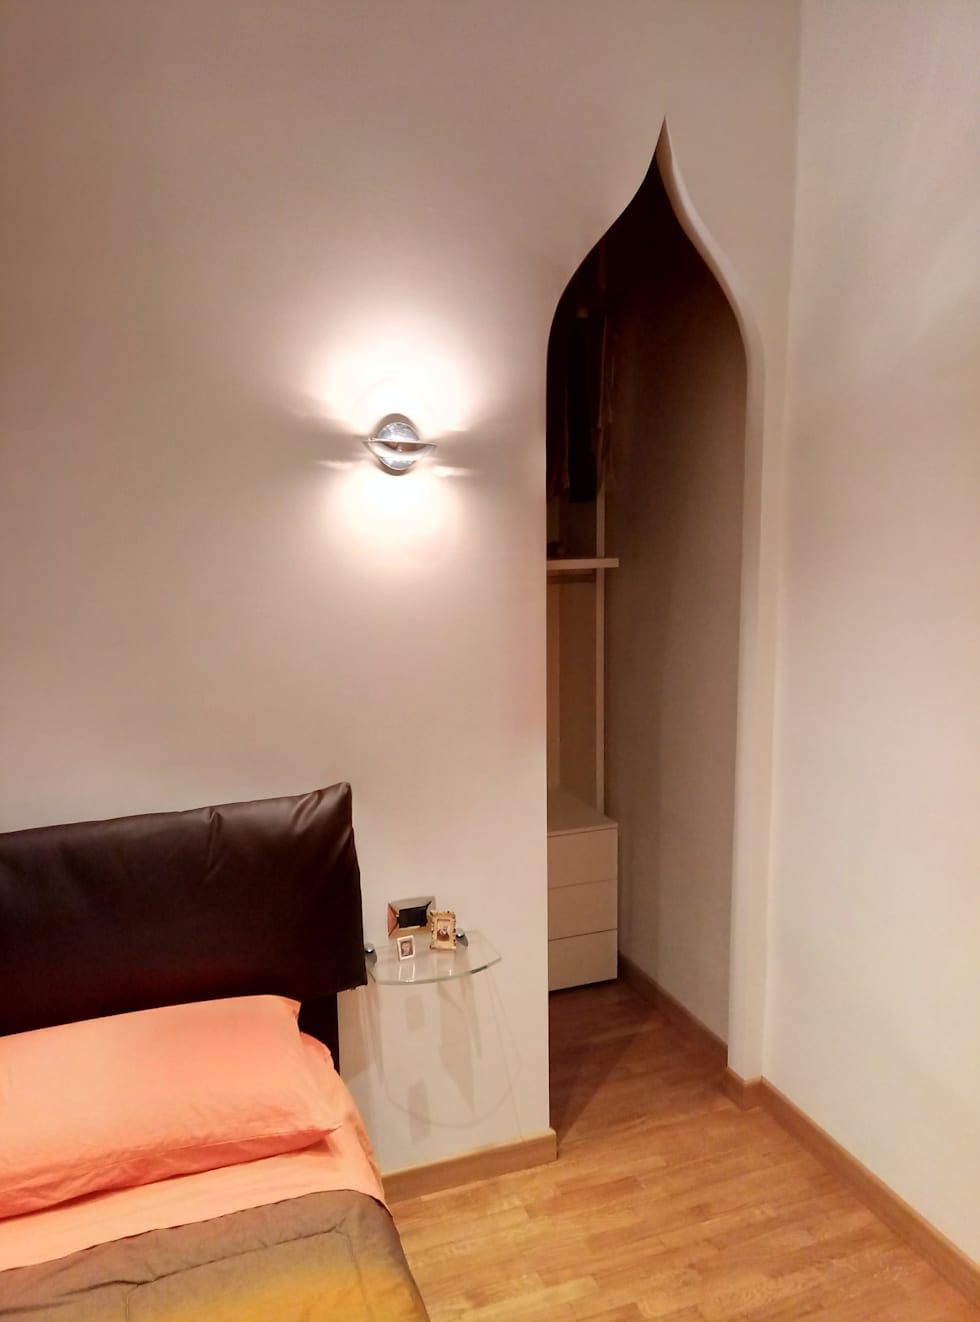 Fotos de decora o design de interiores e remodela es - Cabine armadio cartongesso foto ...